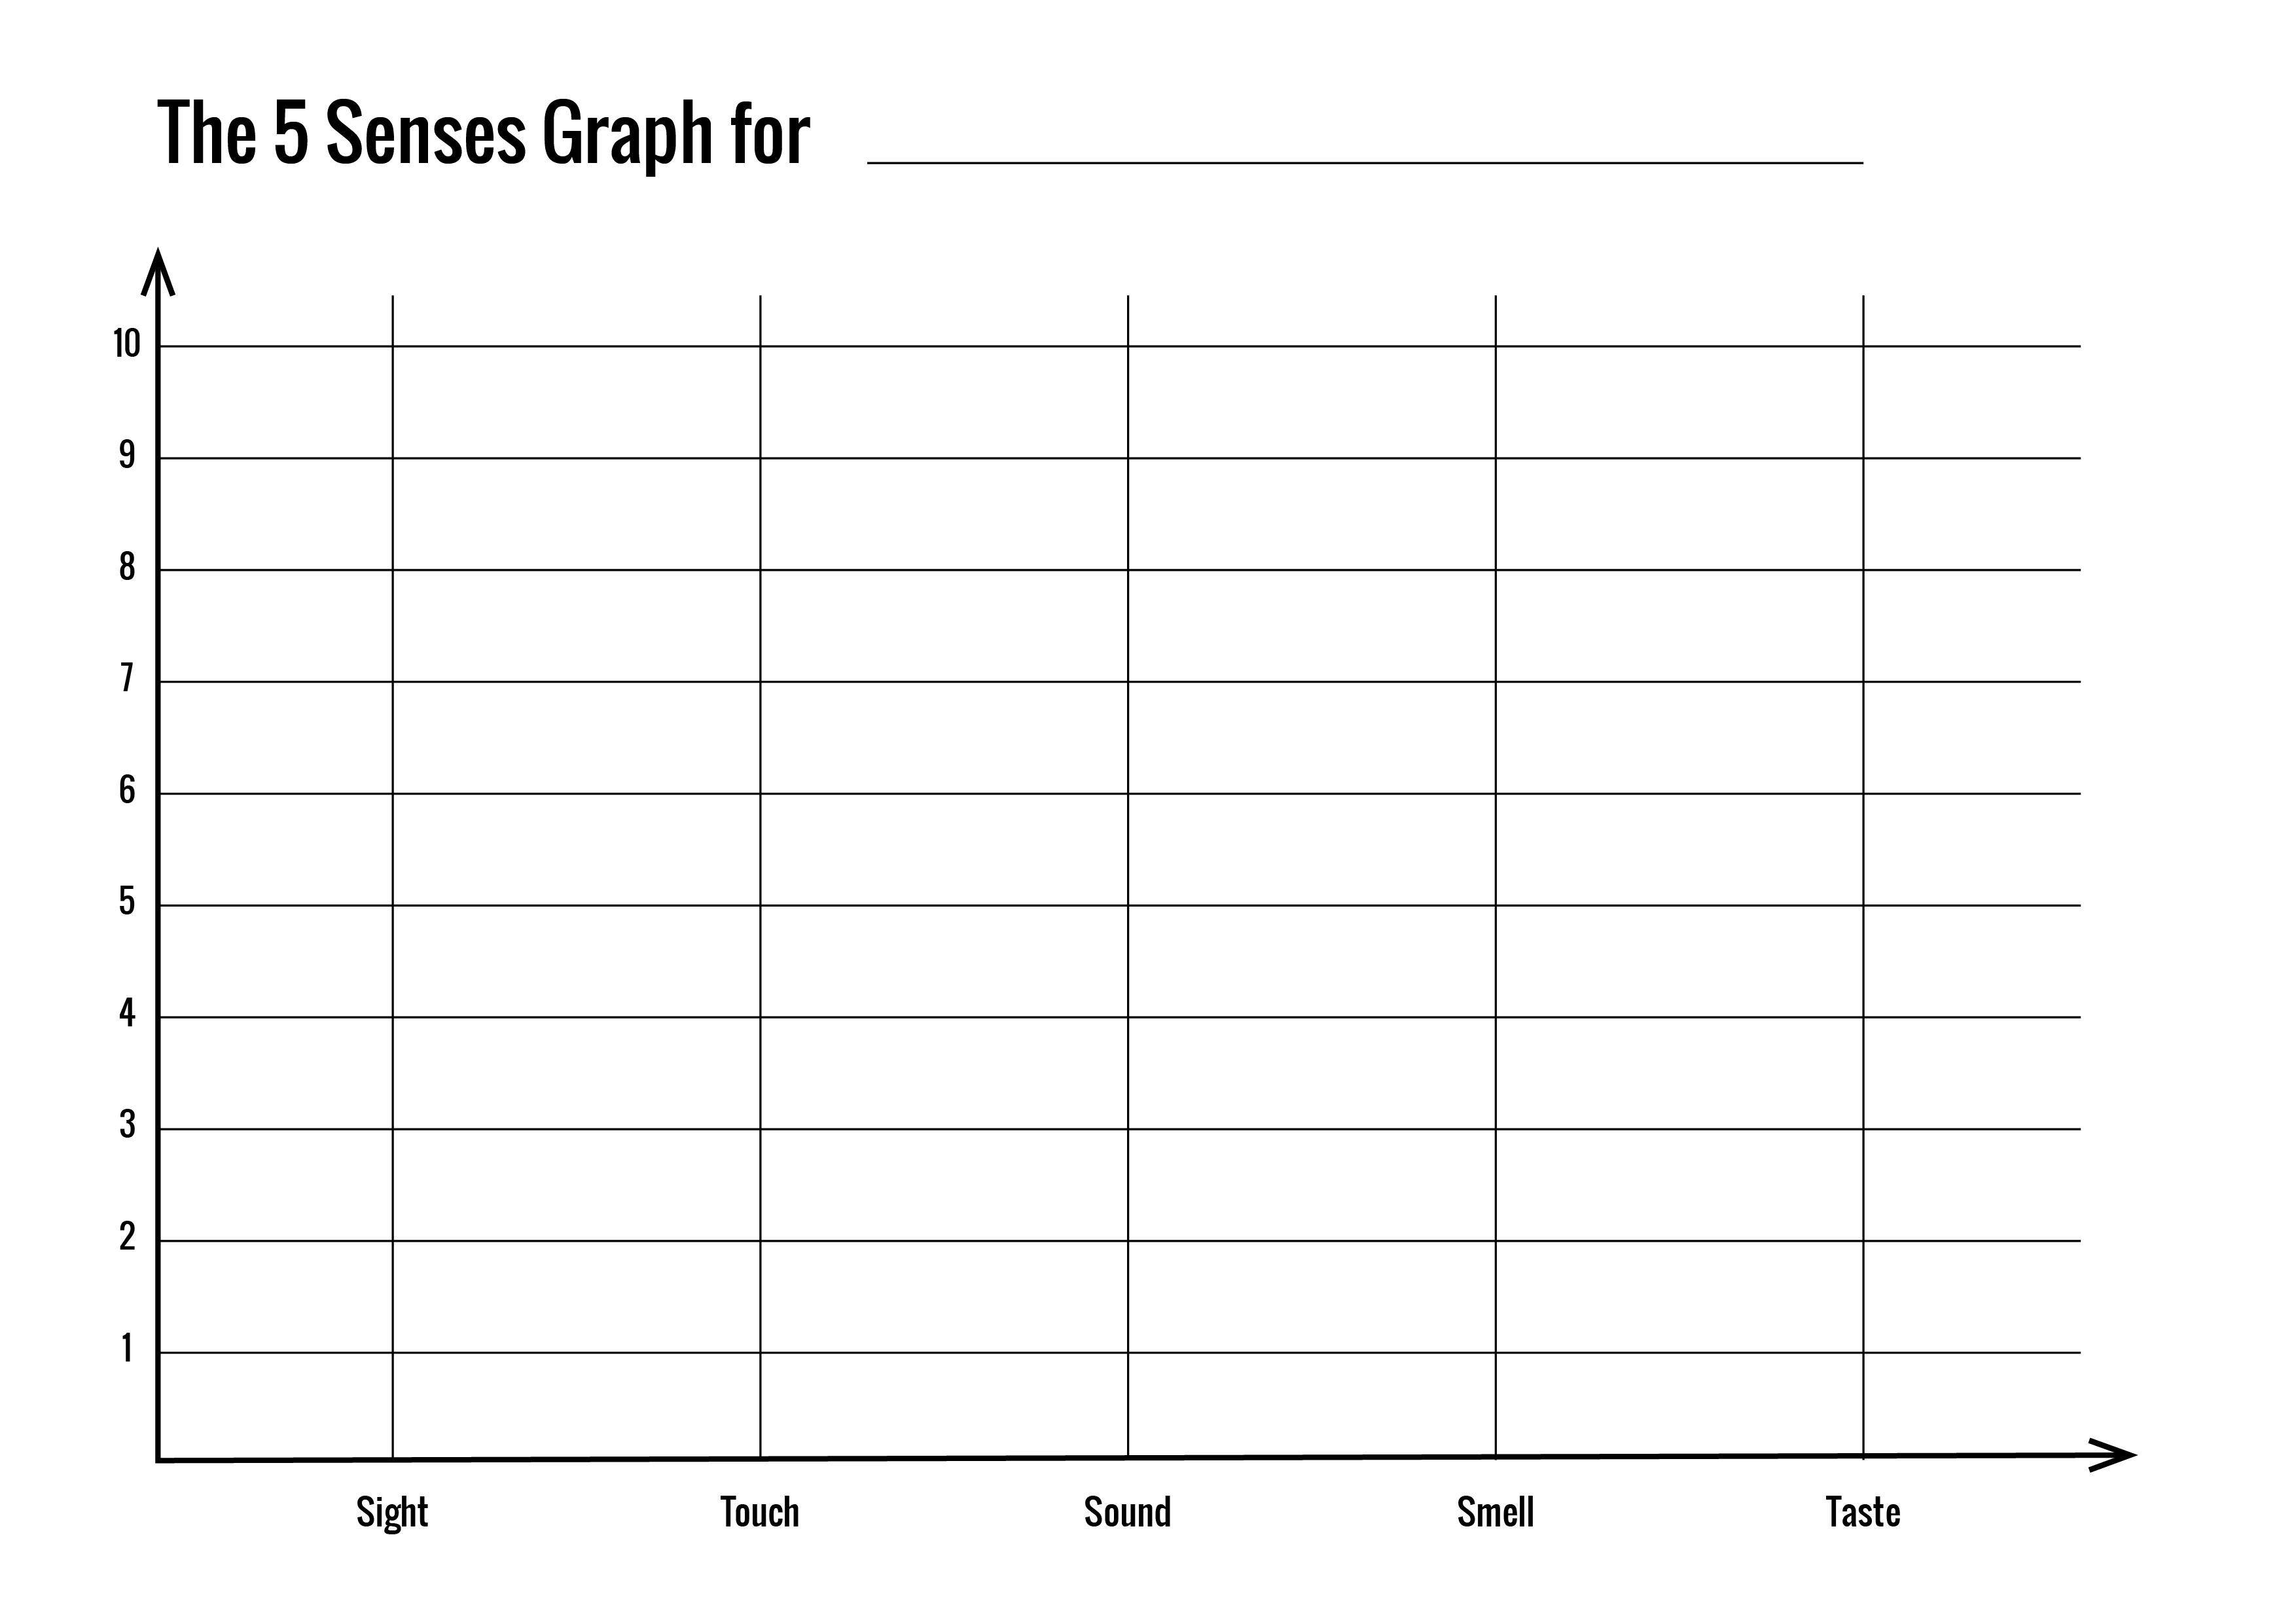 5_senses_graph_original